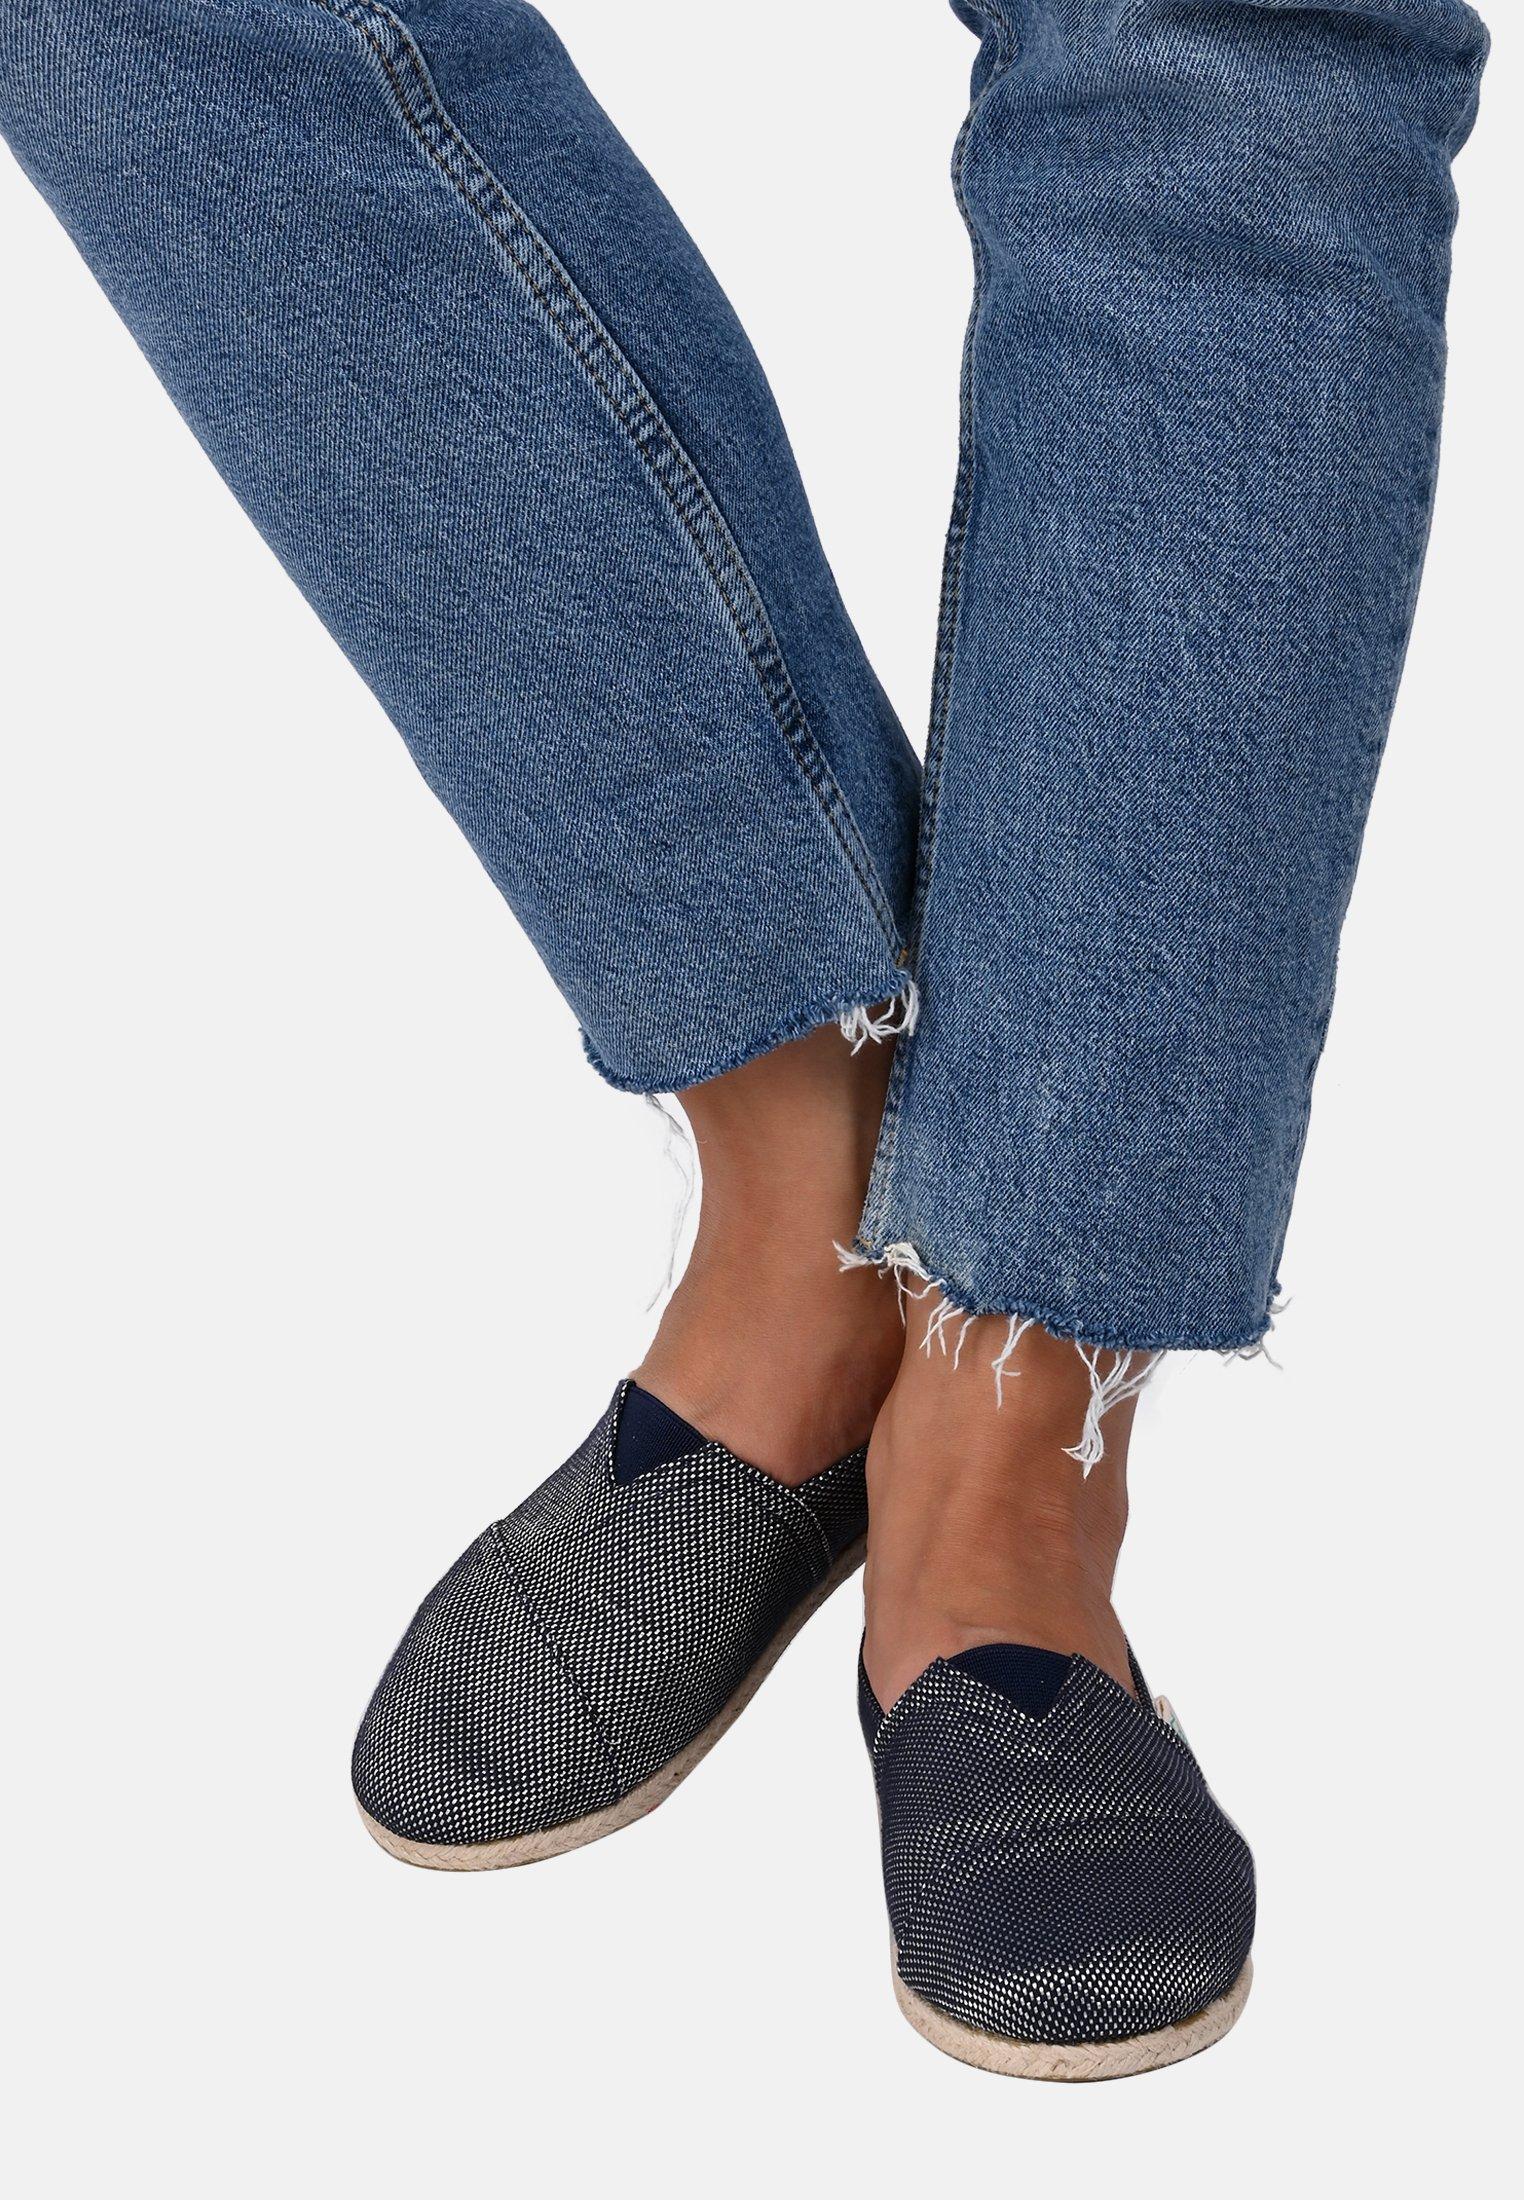 Damen CLASSIC DAY SPARKS - Slipper